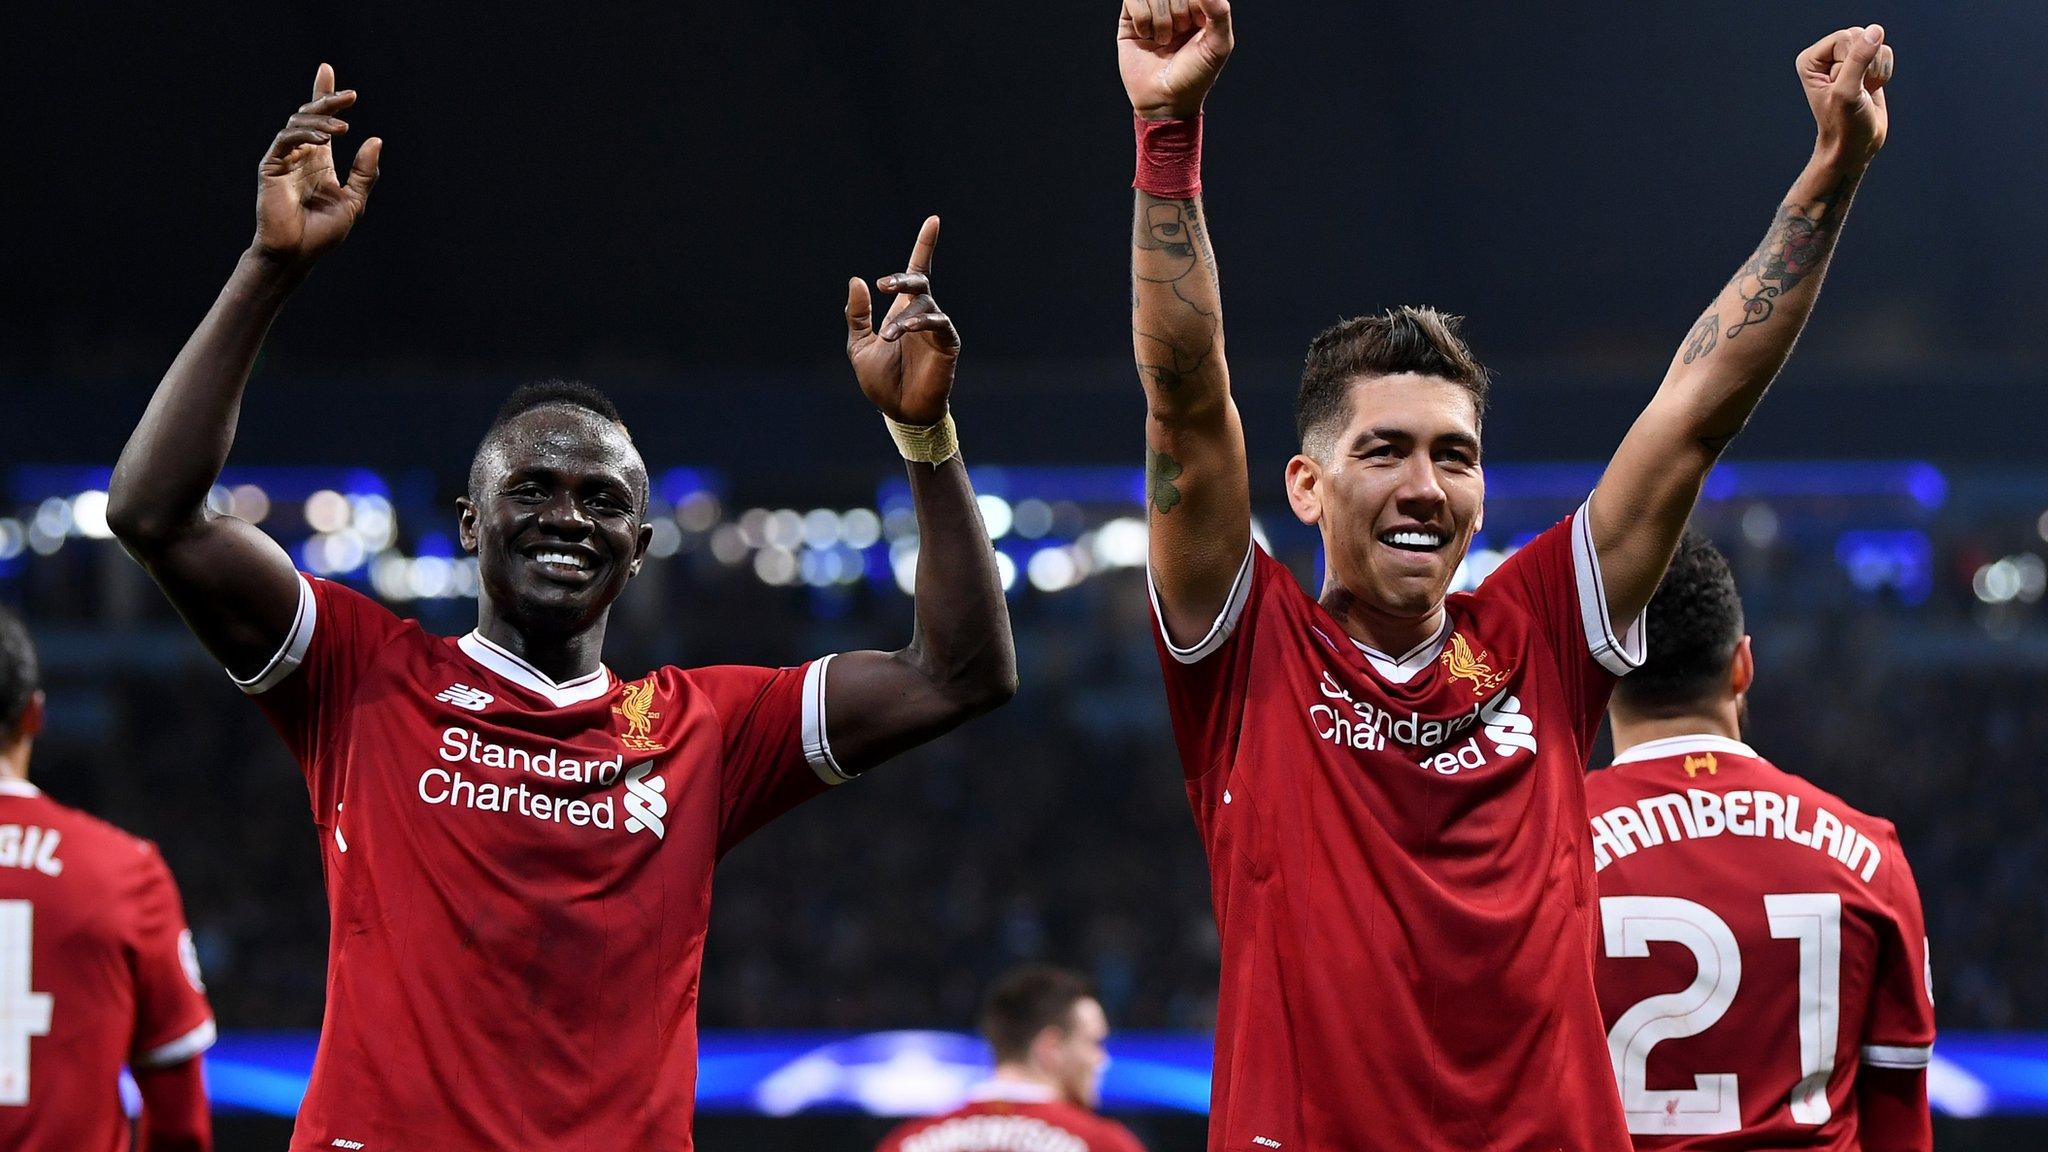 Champions League semi-finals: Liverpool v Roma, Bayern Munich v Real Madrid